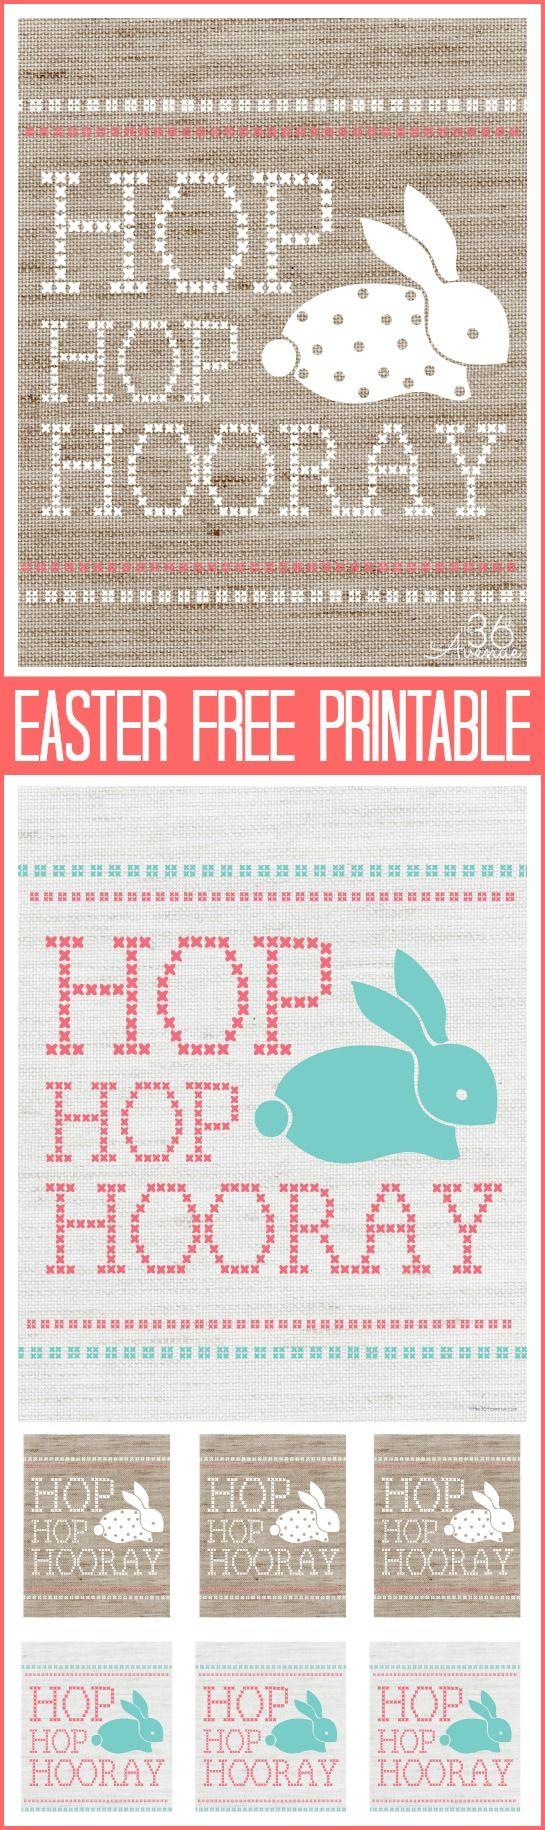 Adorable FREE Easter Printables @Matt Valk Chuah 36th Avenue .com #easter #printable